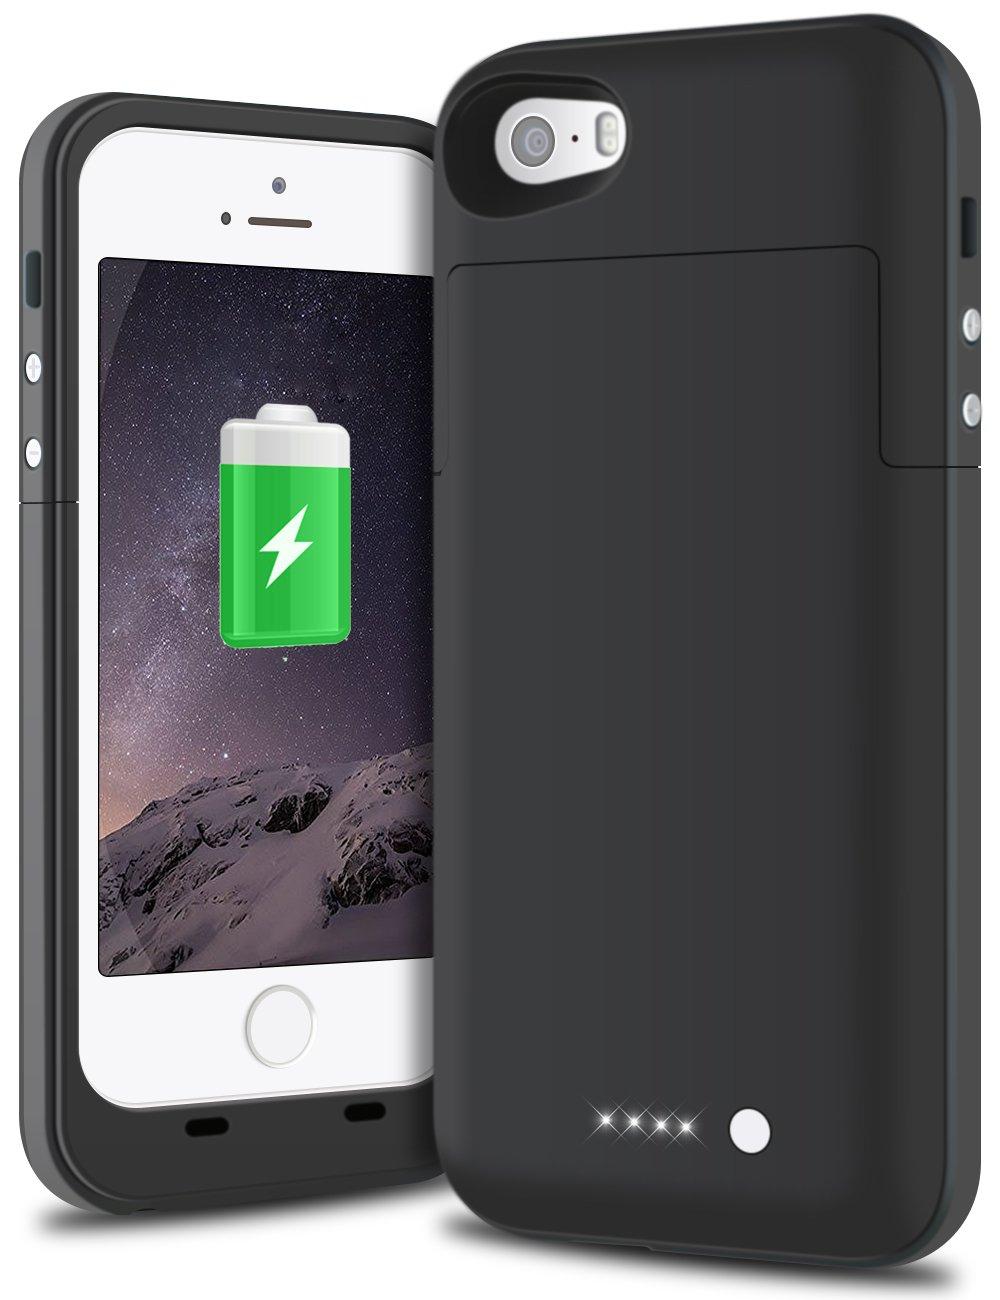 Buy iPhone 5S Battery Case, iPhone 5 Battery Case, HoneyAke